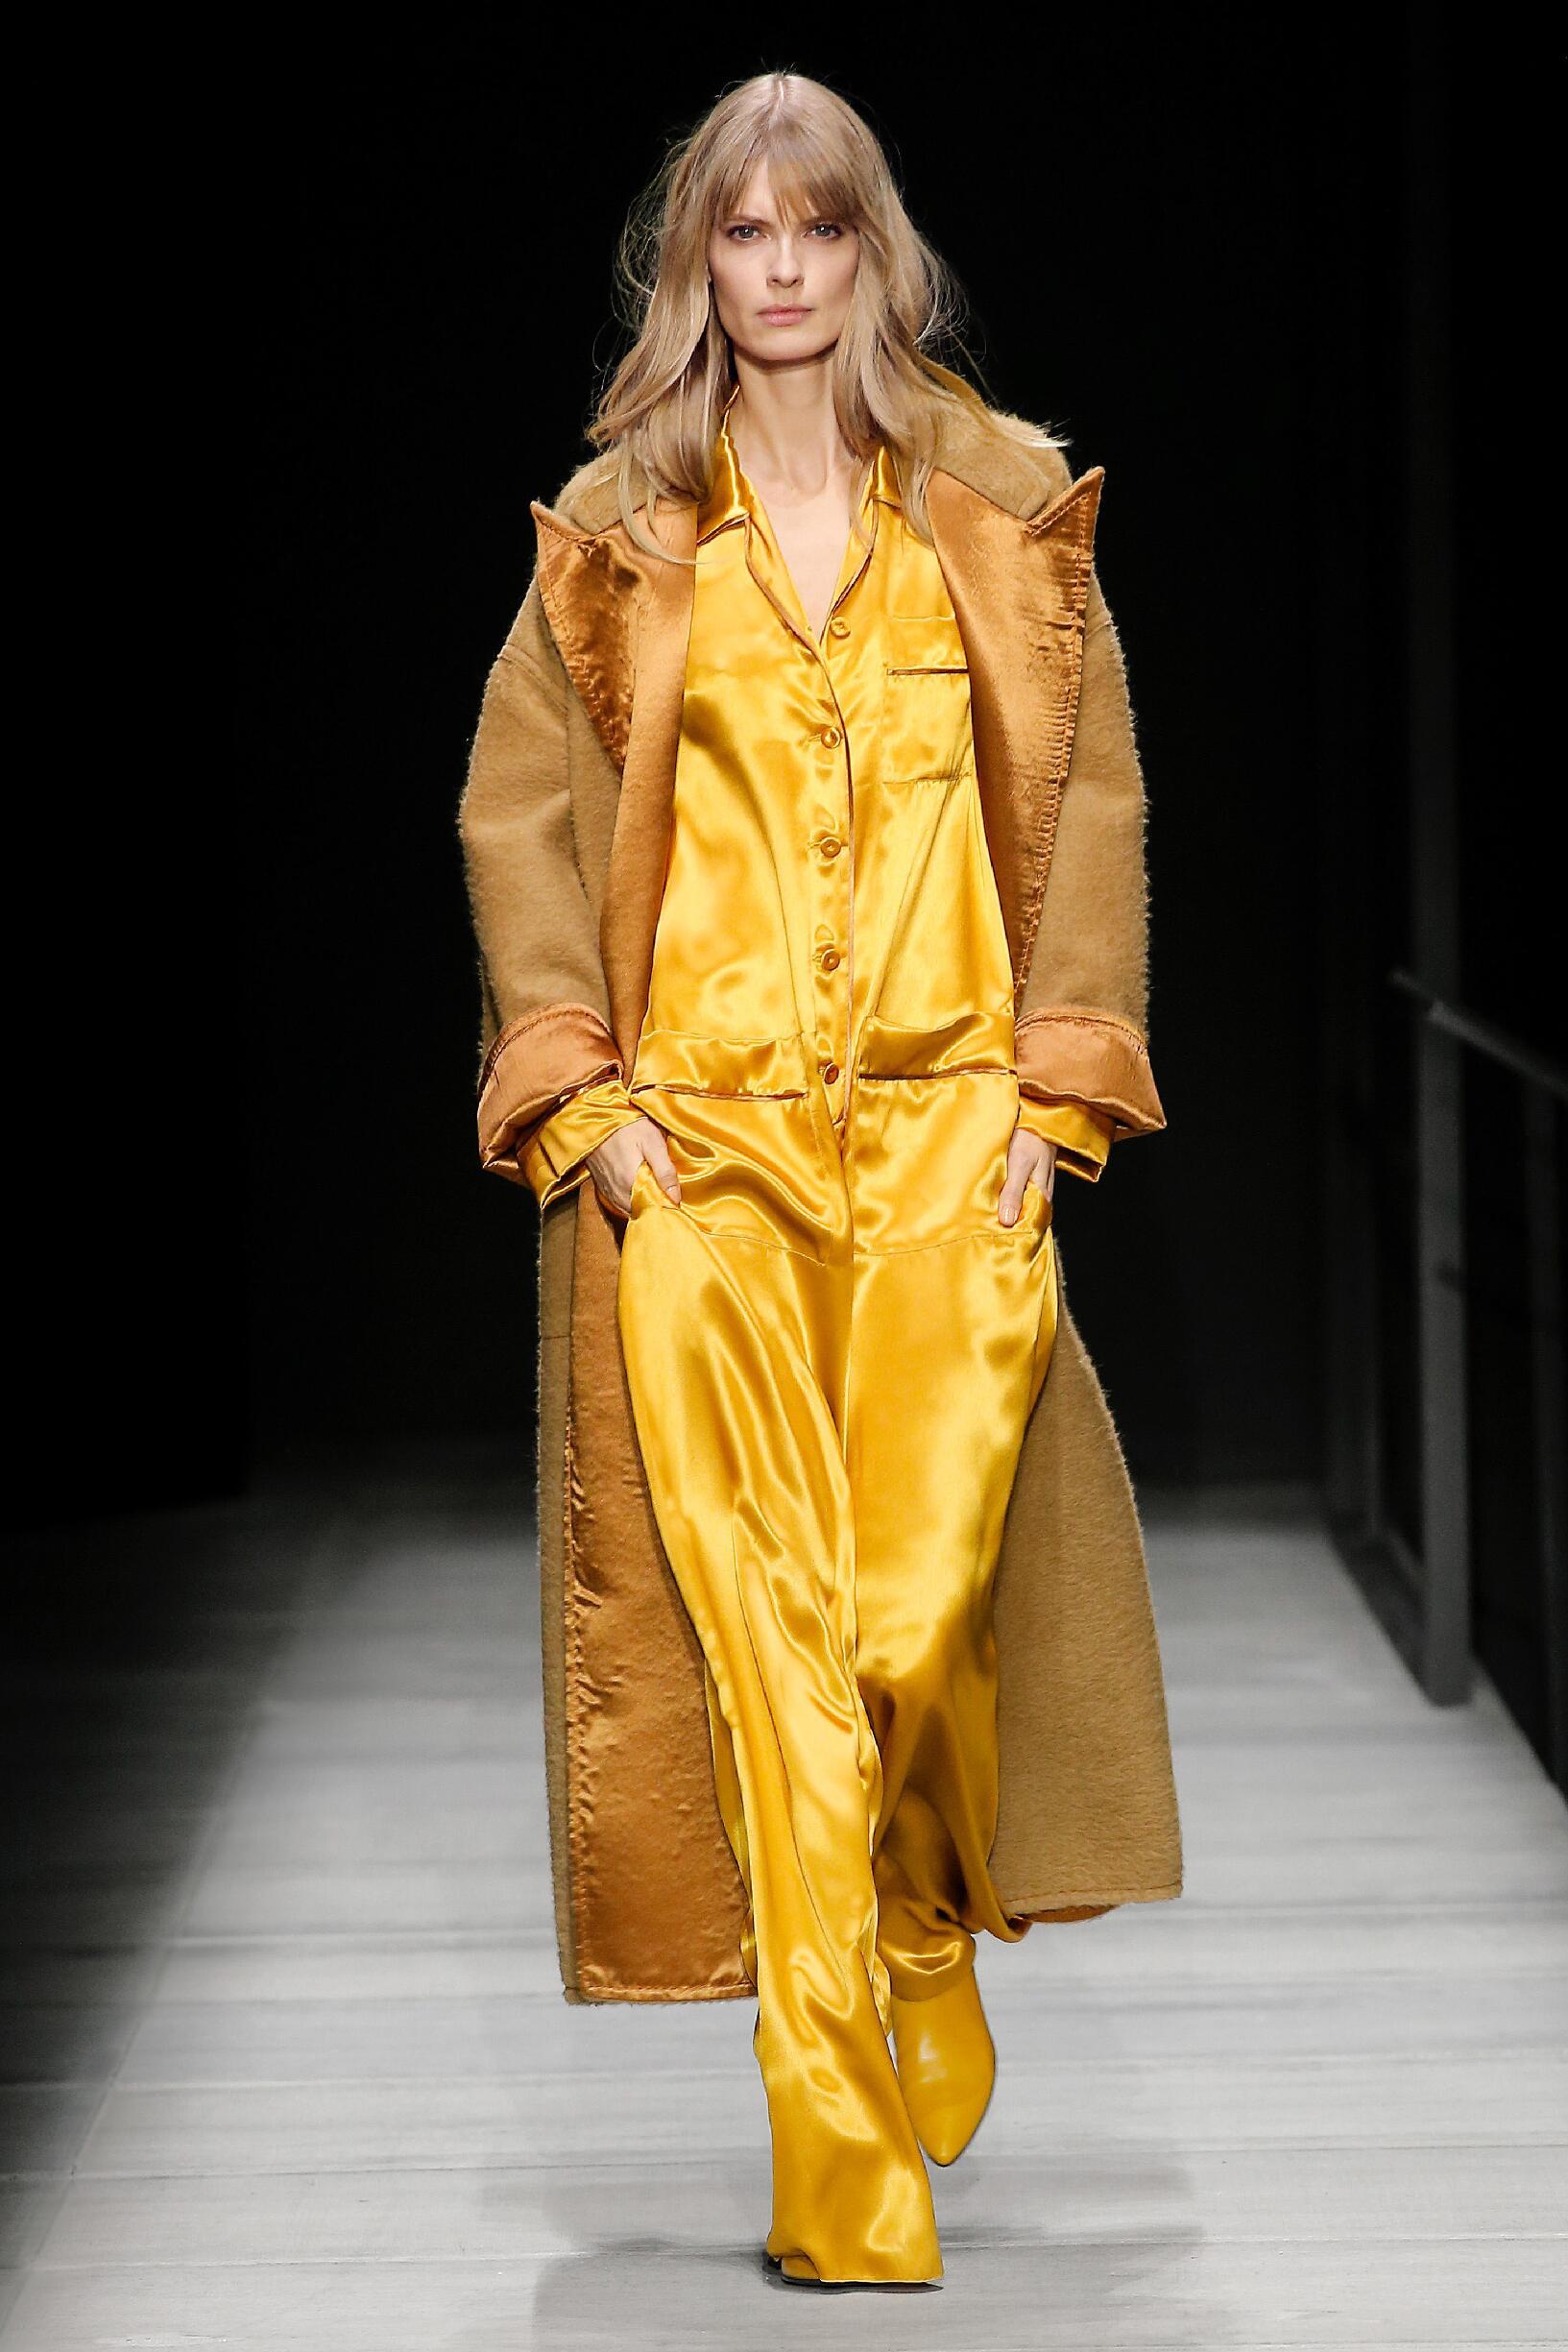 Bottega Veneta Fashion Show FW 2018 Womenswear